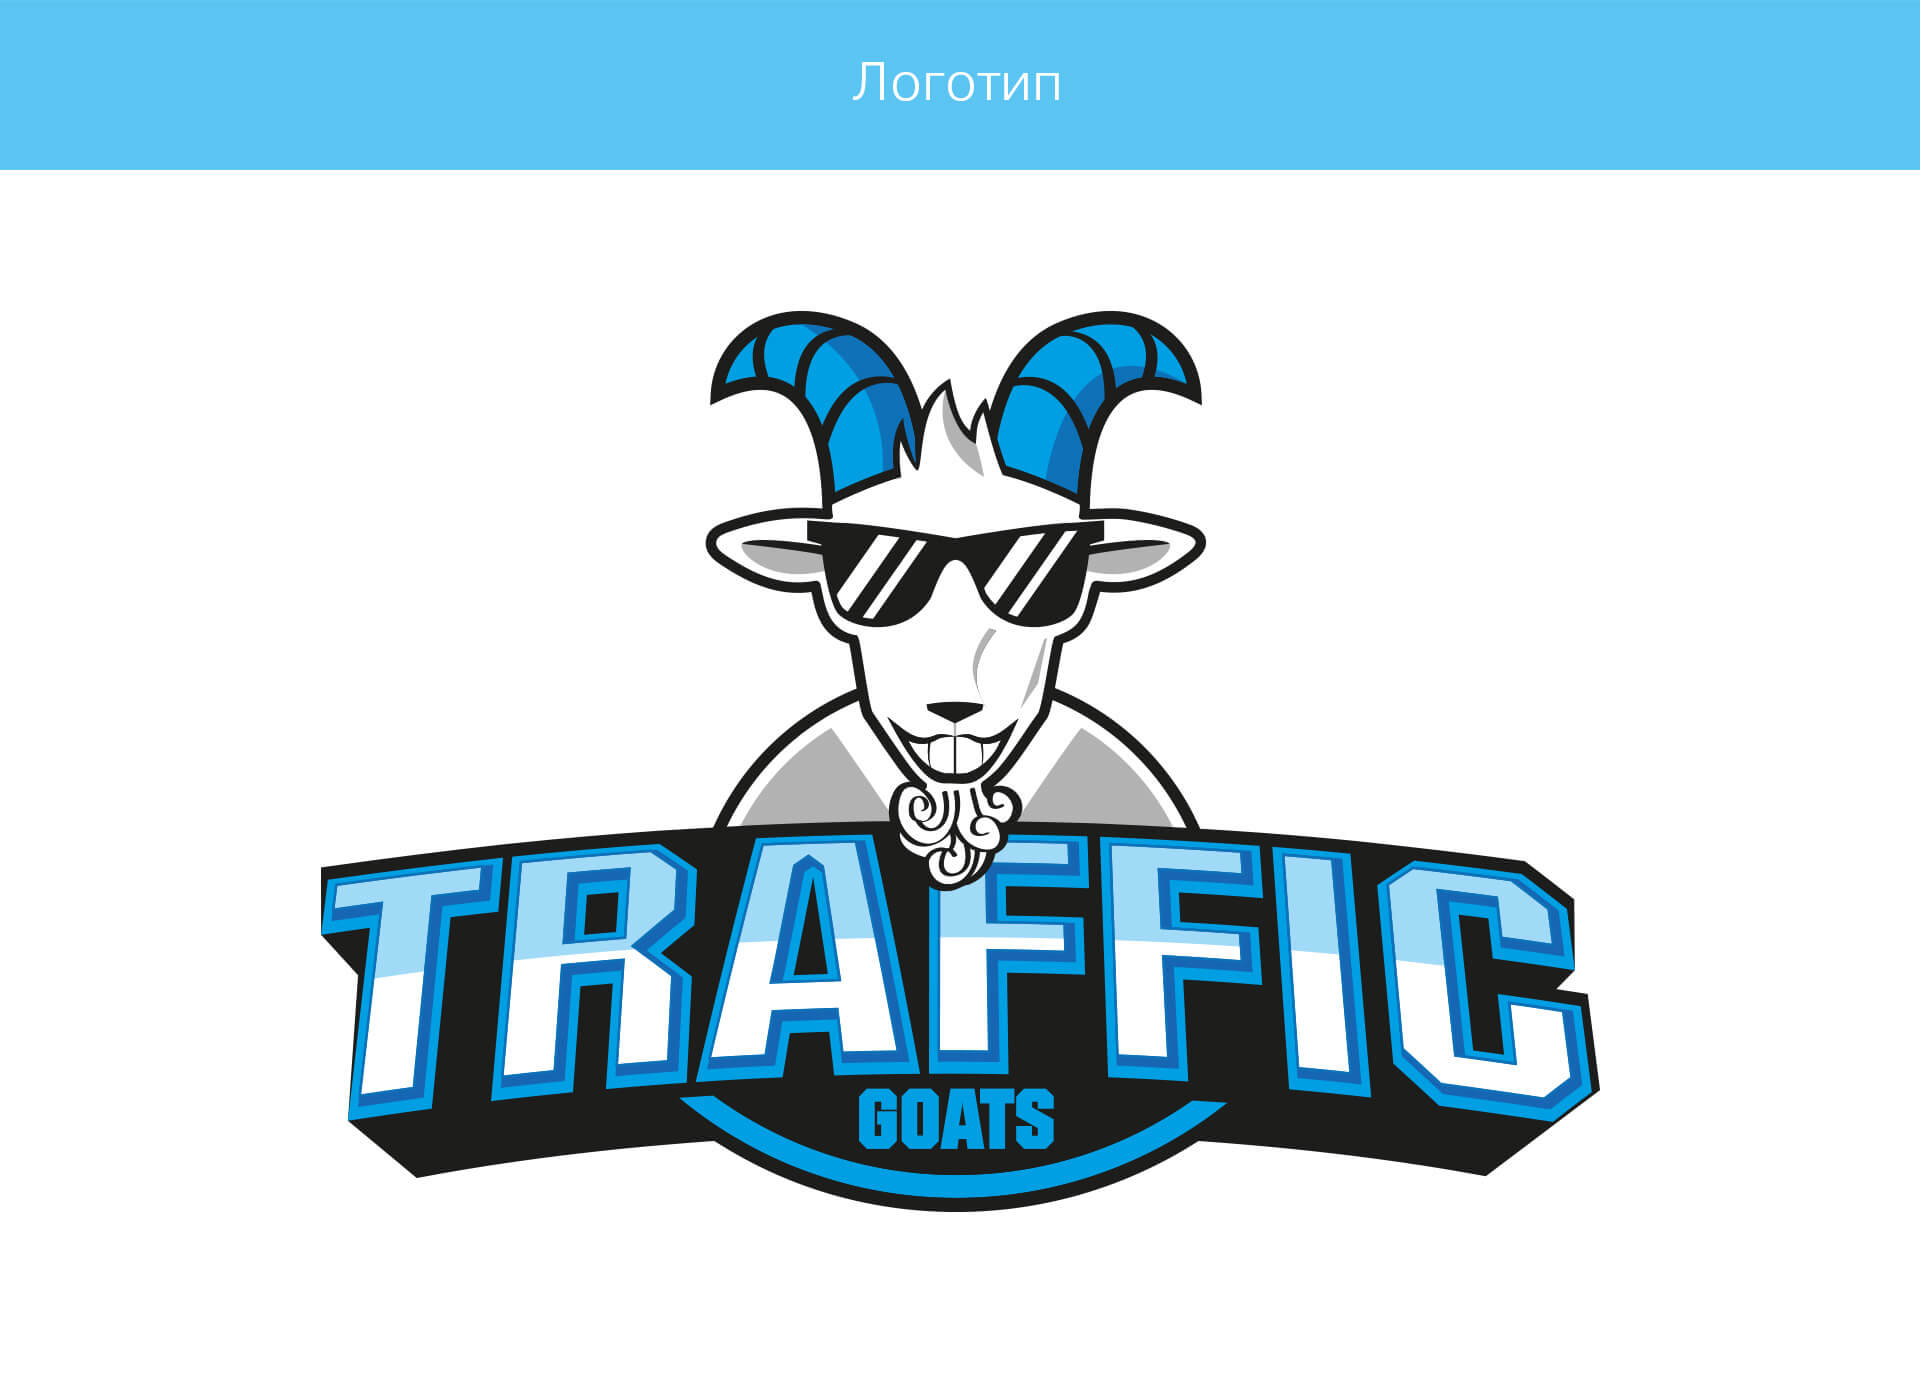 Prokochuk_Irina_logo_Traffic Goats